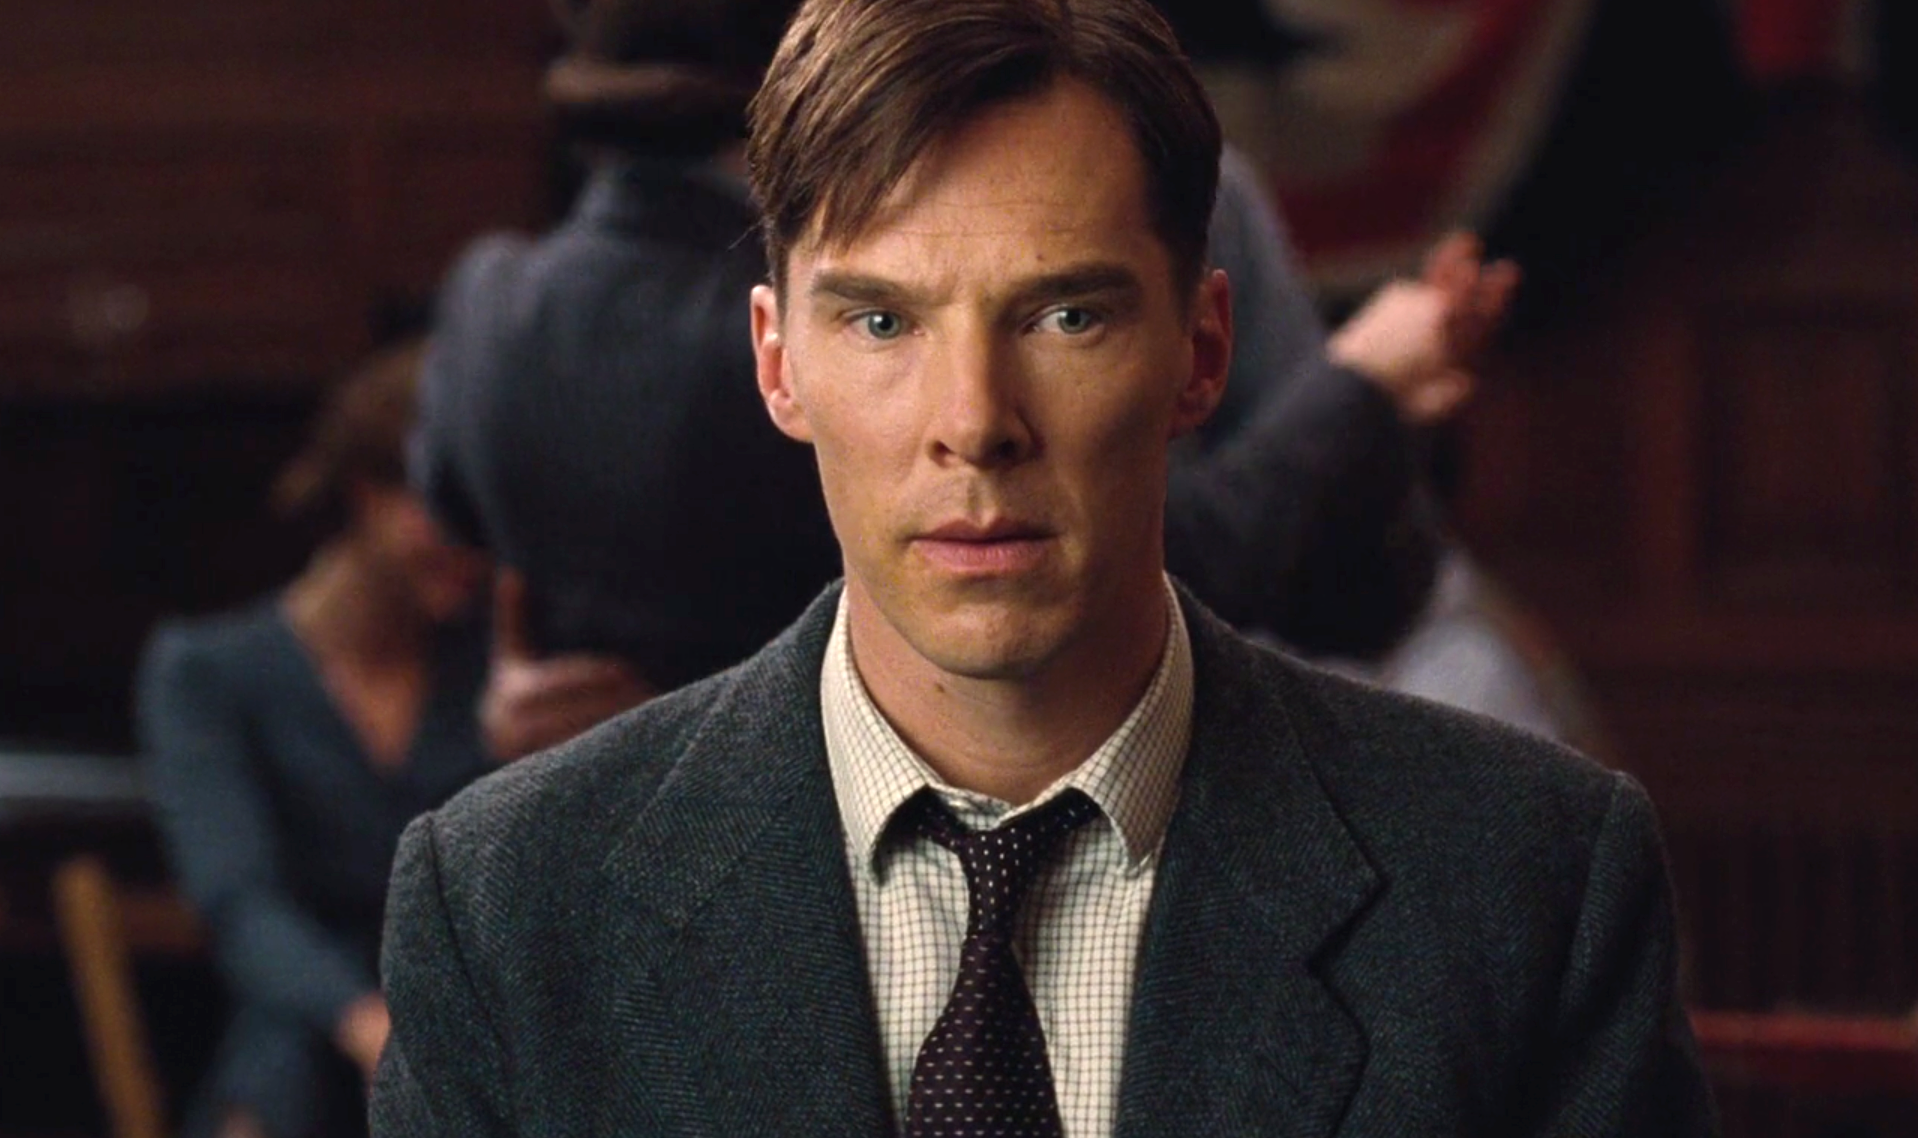 The Imitation Game 2014 Alan Turing Benedict Cumberbatch 2 British Greats The Movie My Life